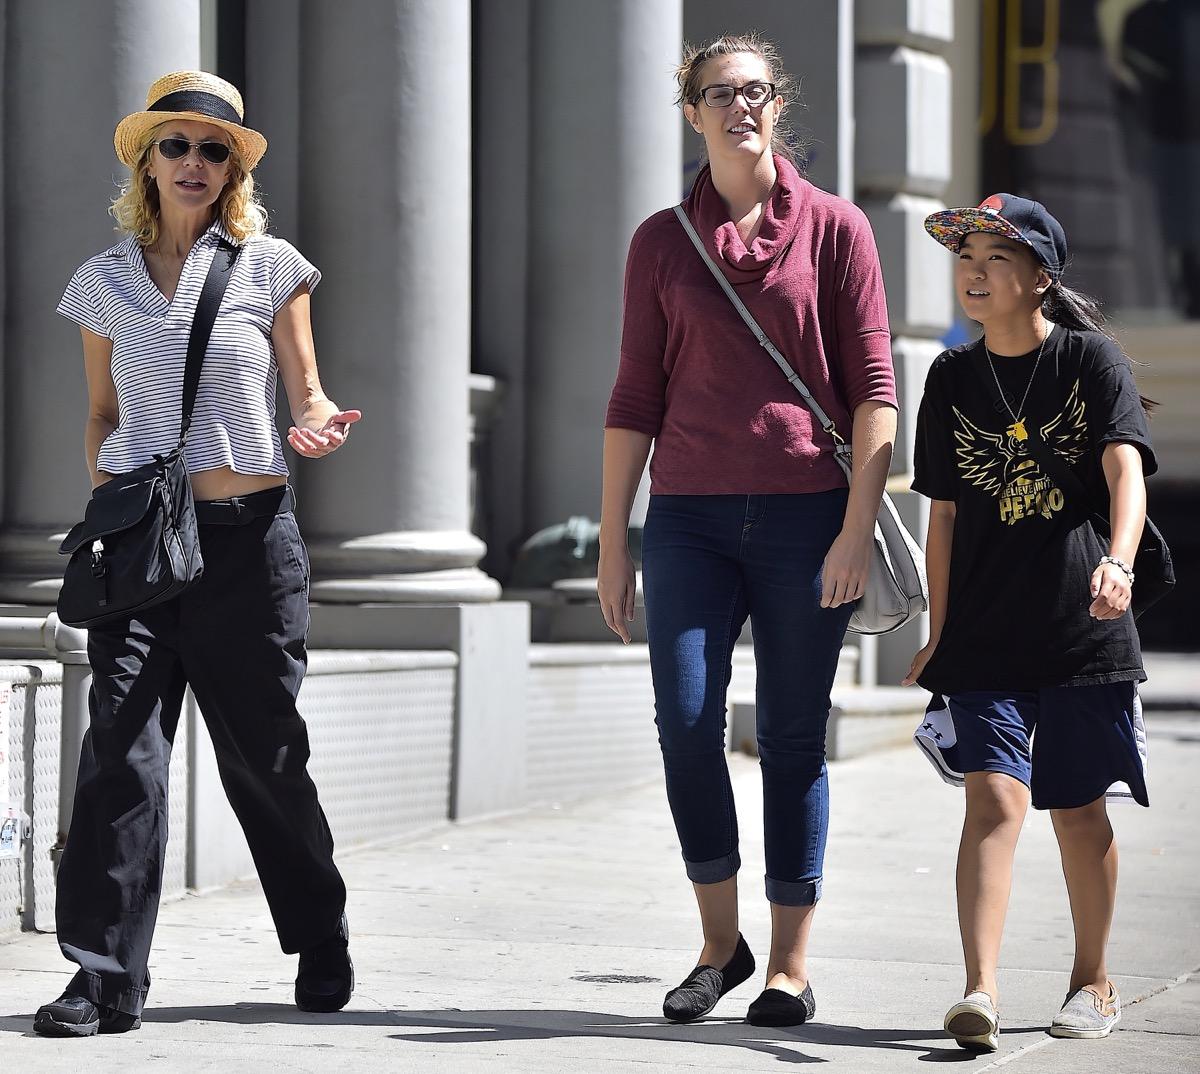 Meg Ryan and Daisy True Ryan walking in NYC